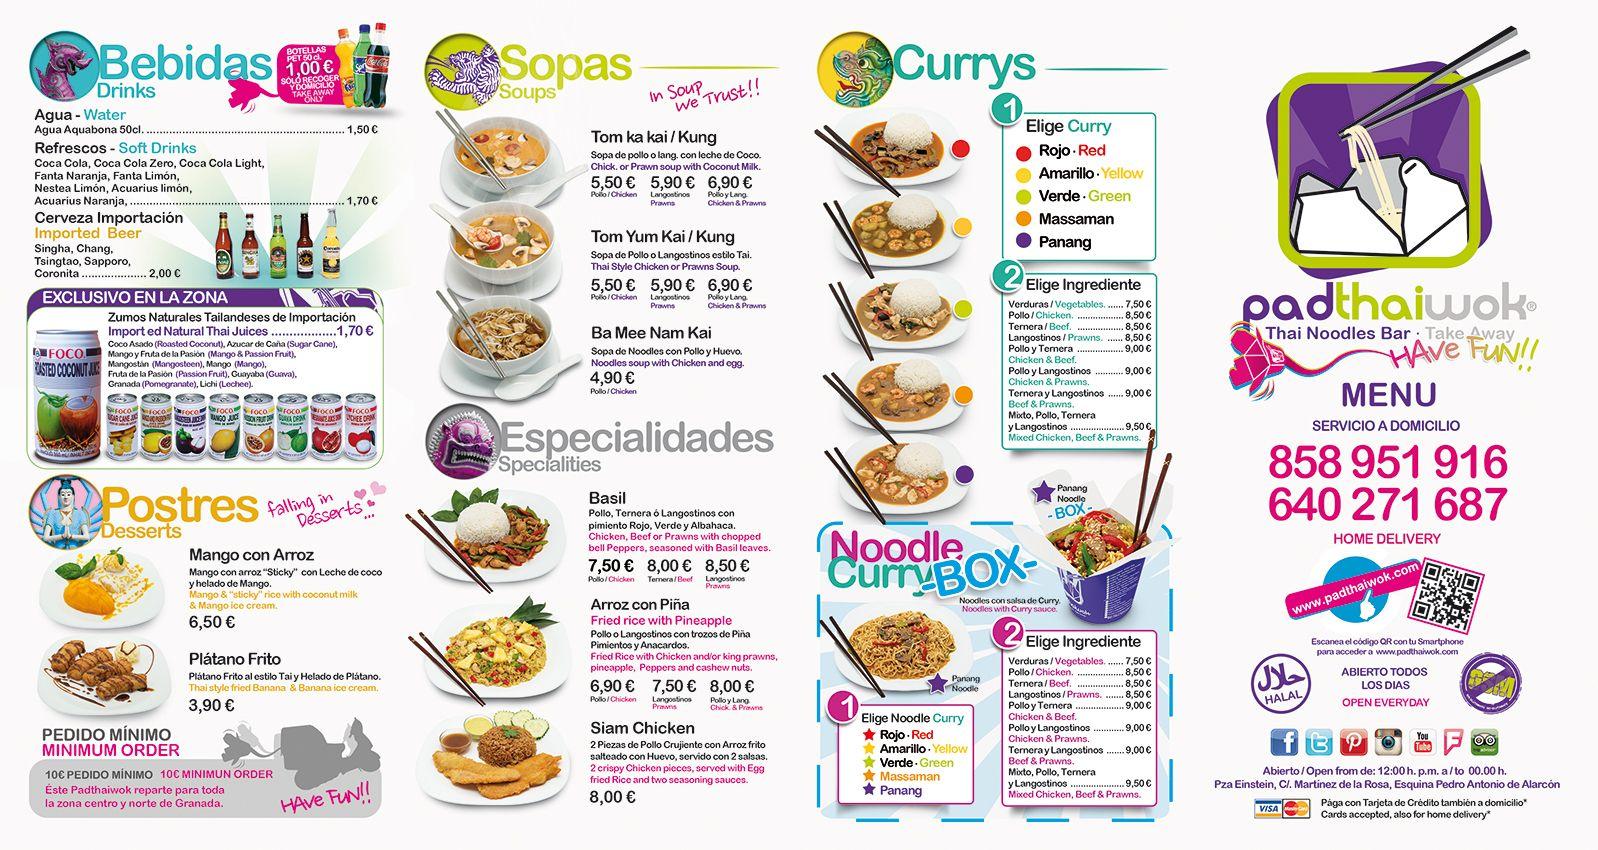 Thai Noodles Bar Take Away Padthaiwok Comida A Domicilio Comida Comida Congelada